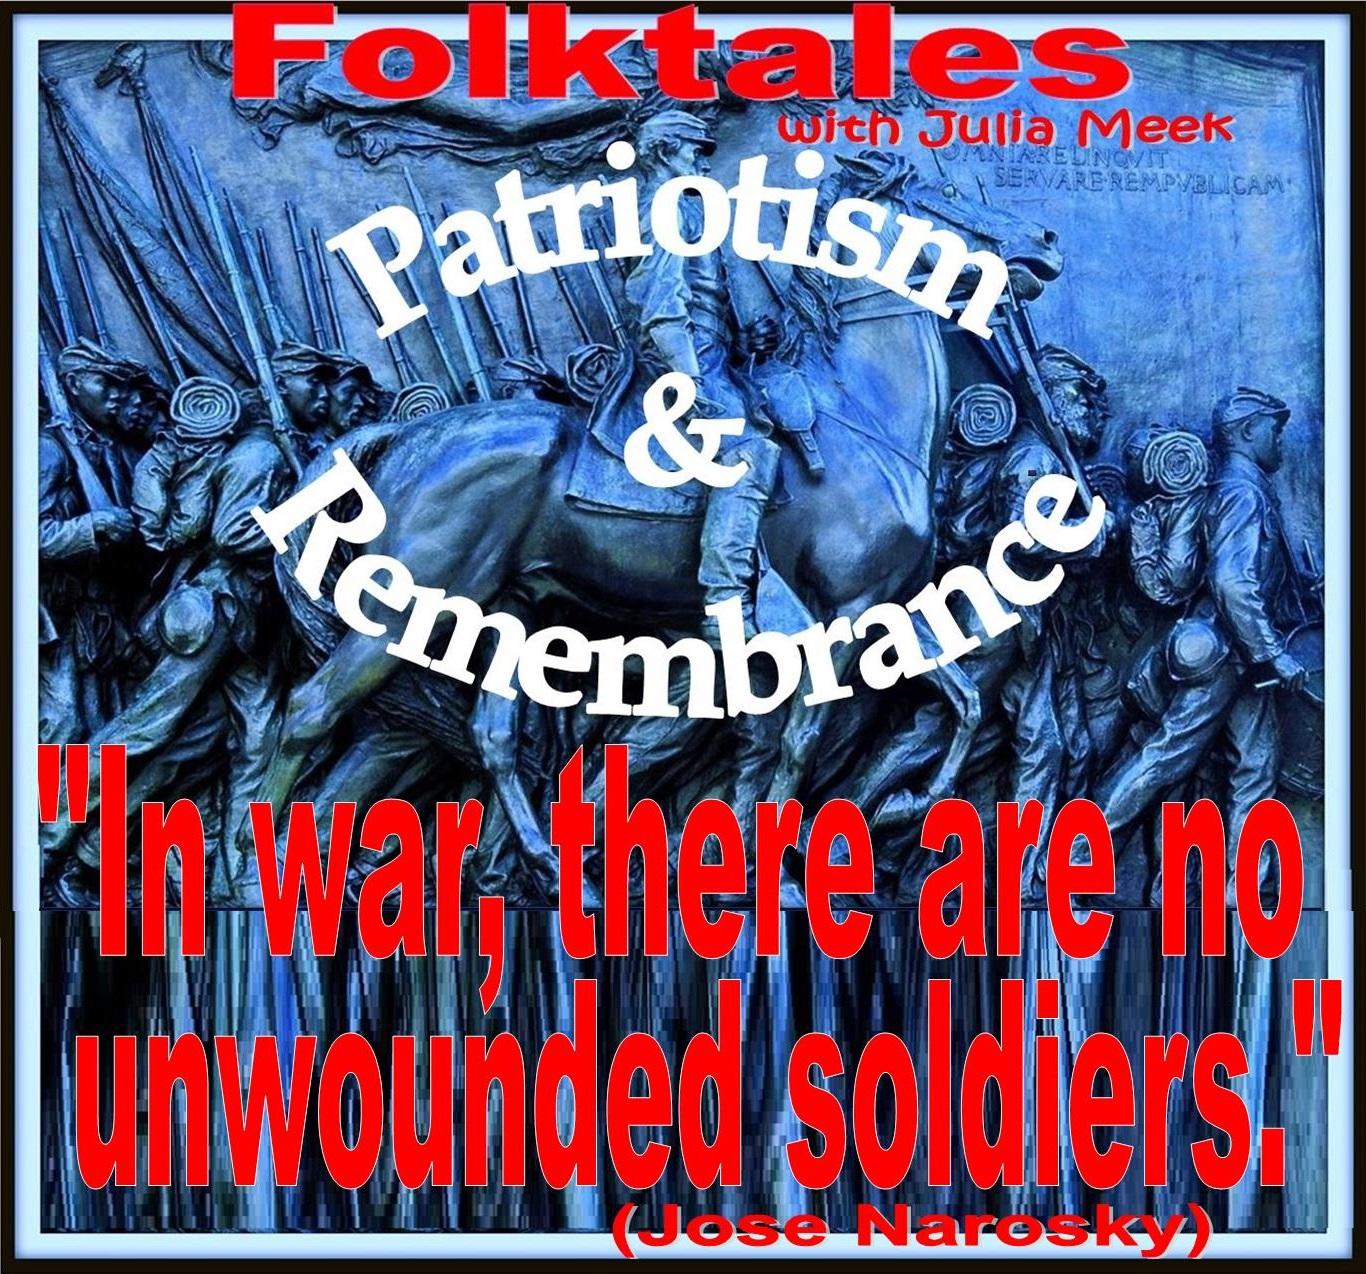 Caption: WBOI's Folktale of Patriotism & Remembrance, Credit: Julia Meek